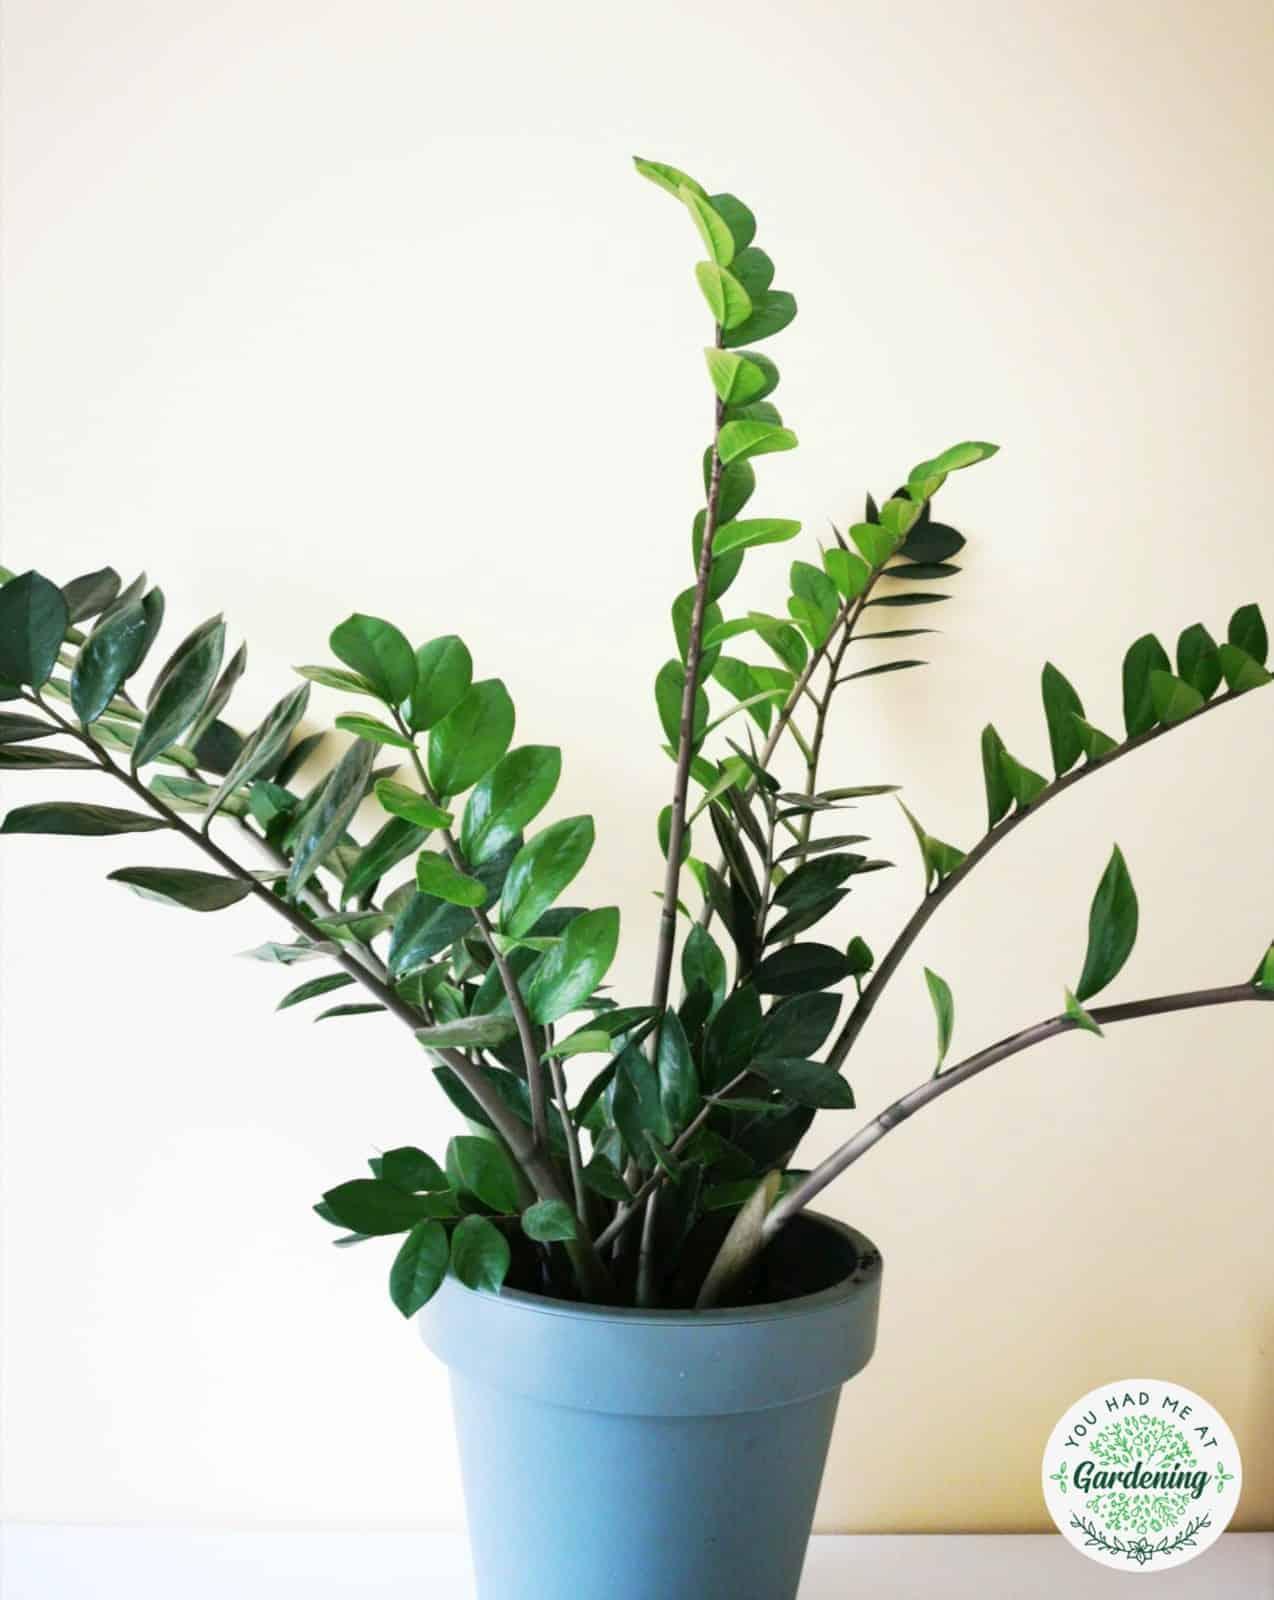 Medium sized zz plant